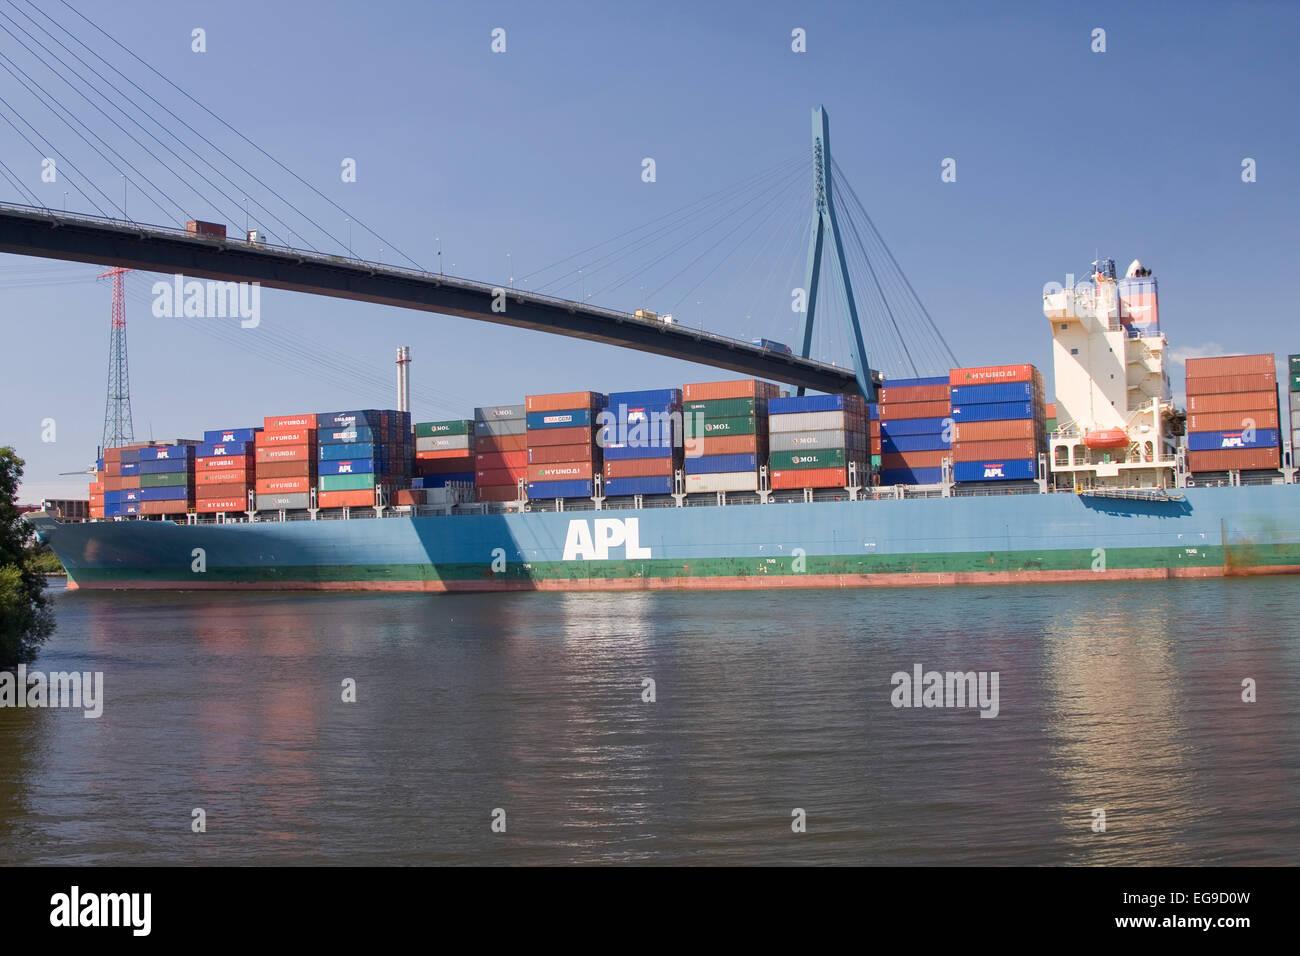 Container ship driving under the Köhlbrand bridge, Hamburg, Germany, Europe Stock Photo